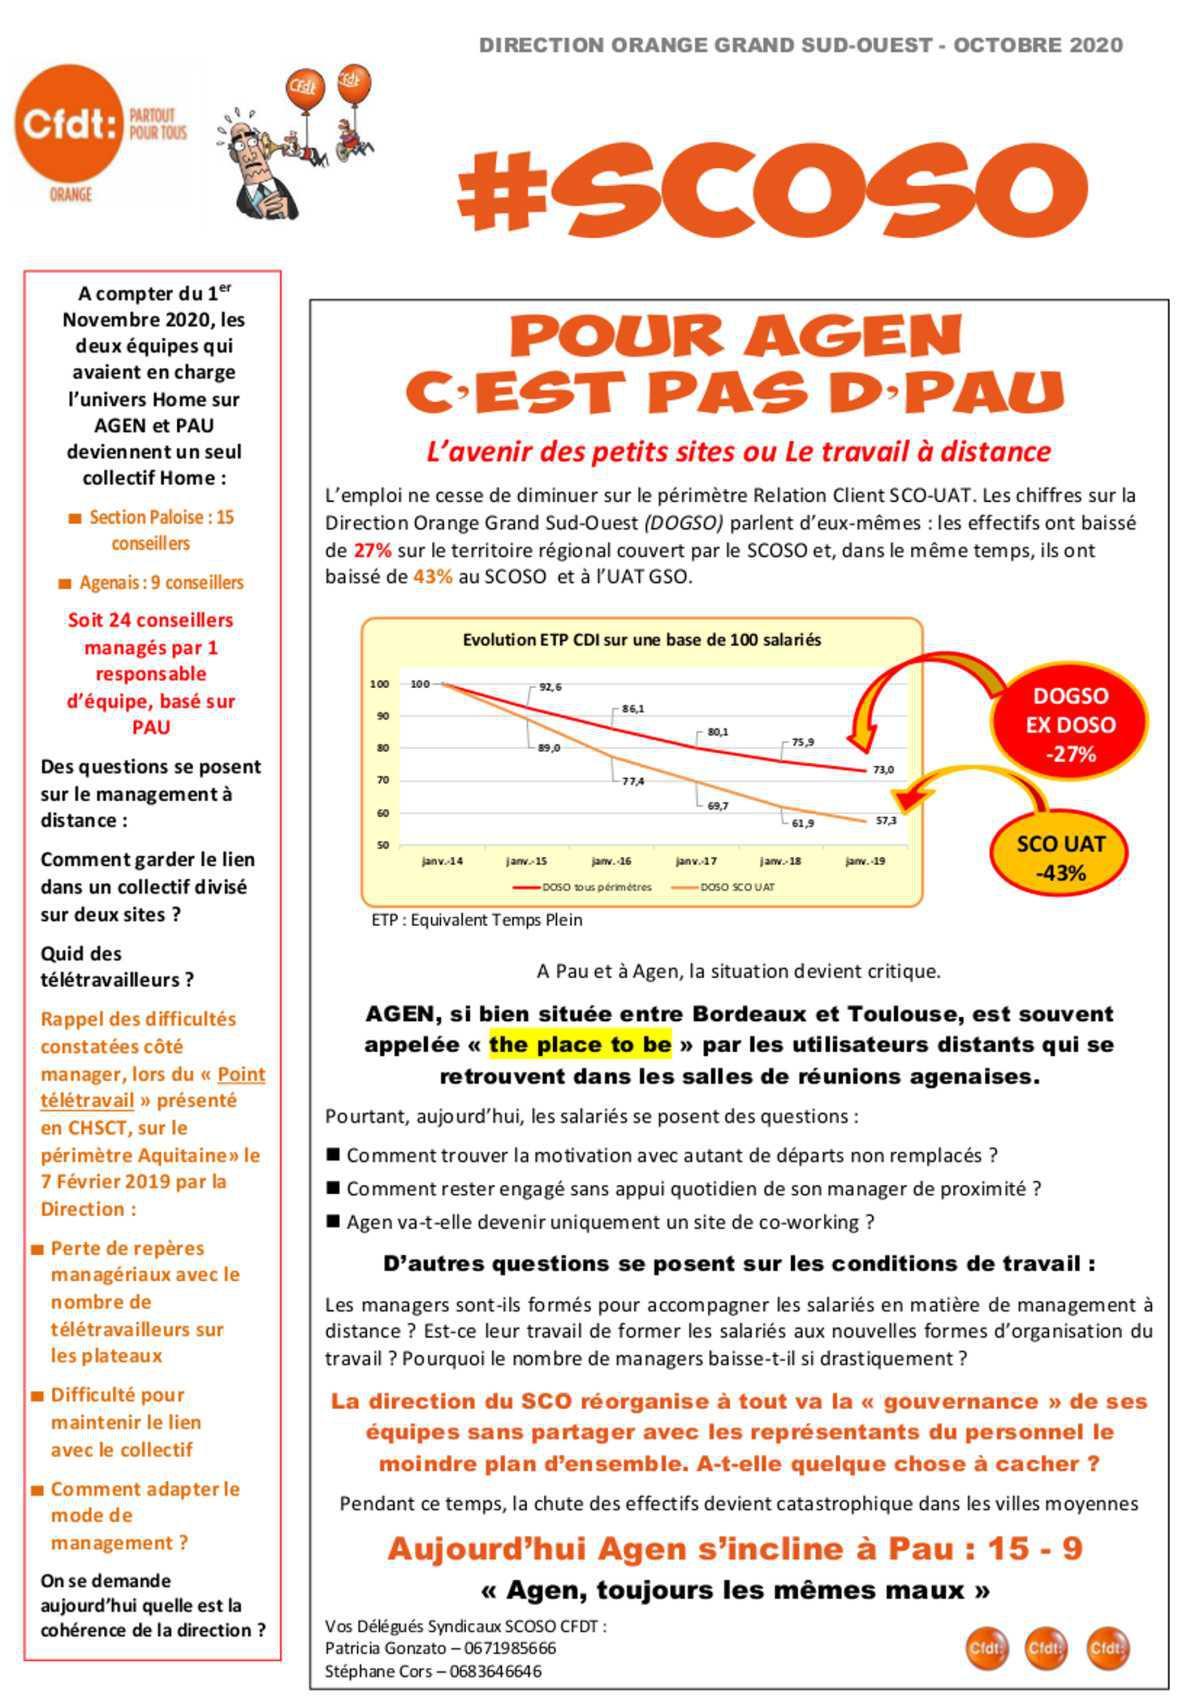 SCO - Agen Pau : RE Mutualisé